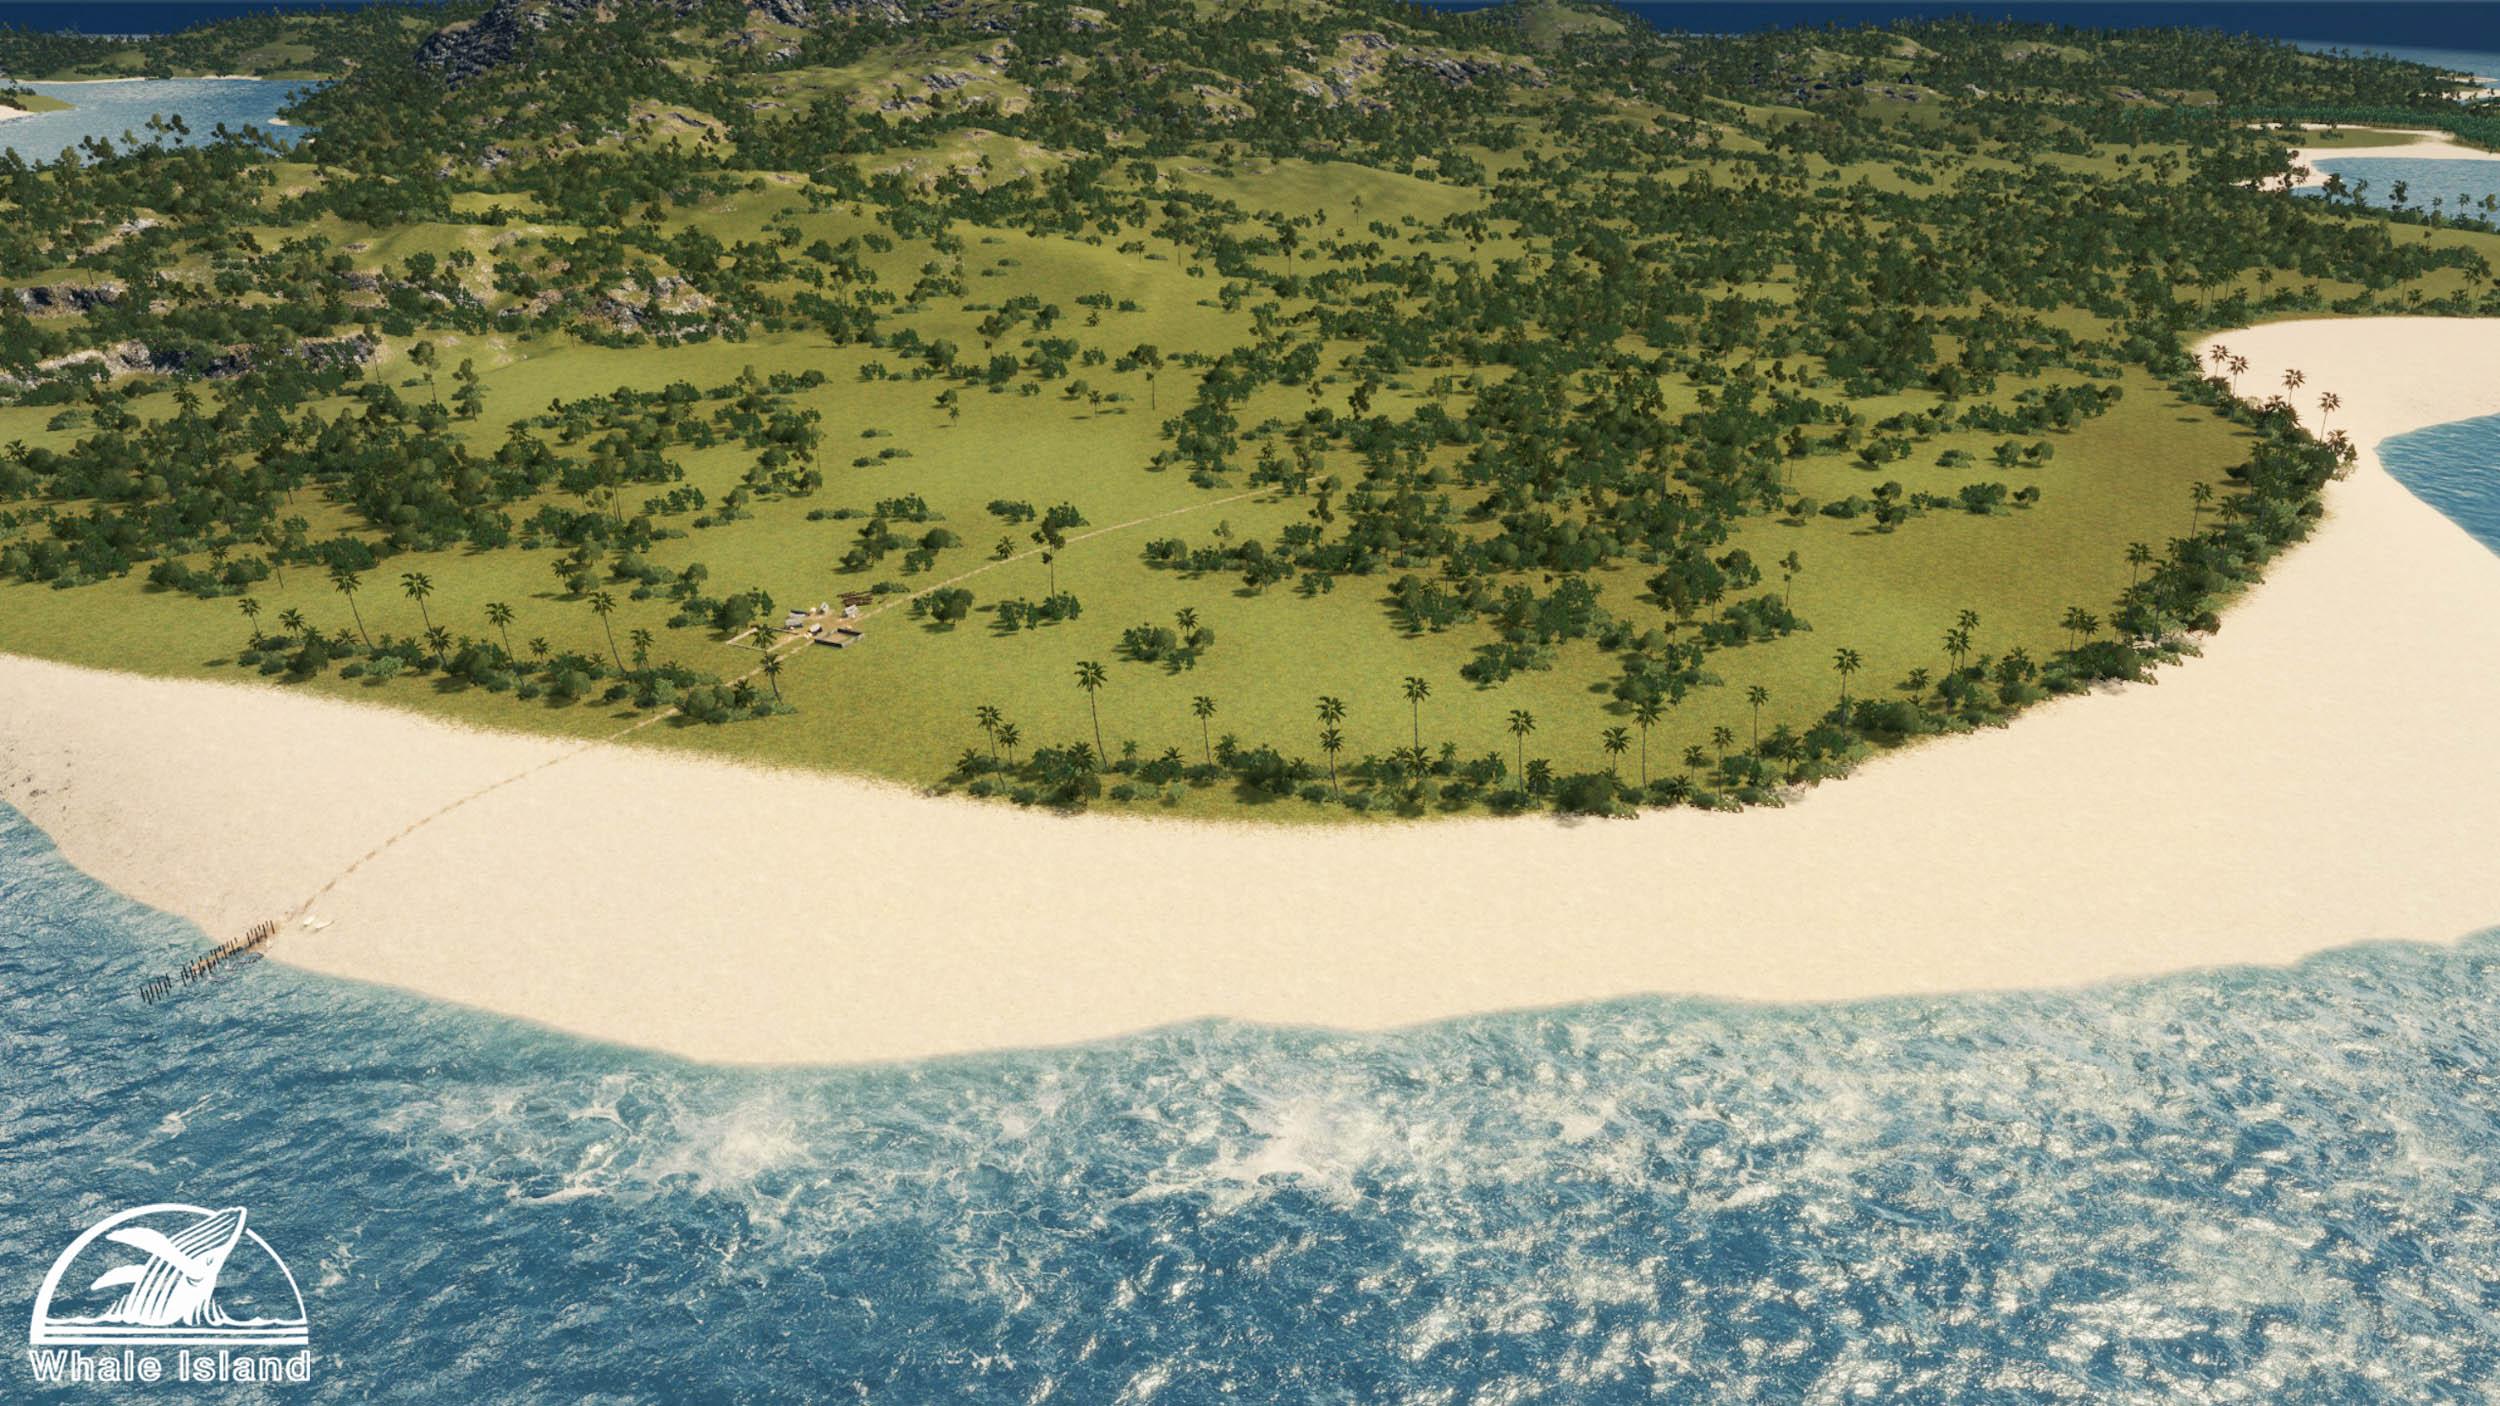 Whale Island - Work in Progress! - Page 2 WhaleIsland-09